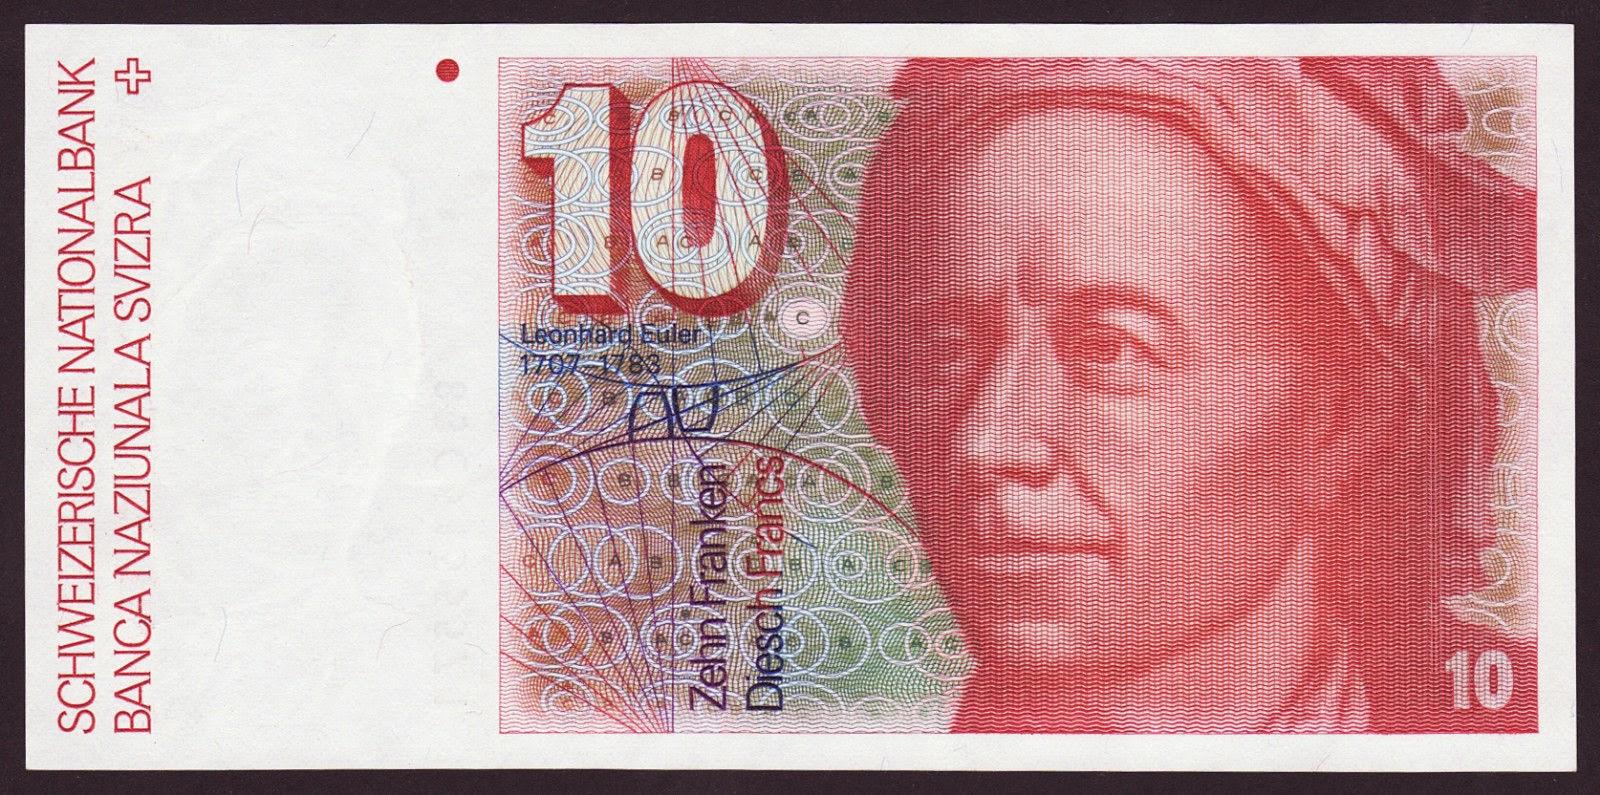 Banknotes of Switzerland 10 Swiss Franc note, Leonhard Euler